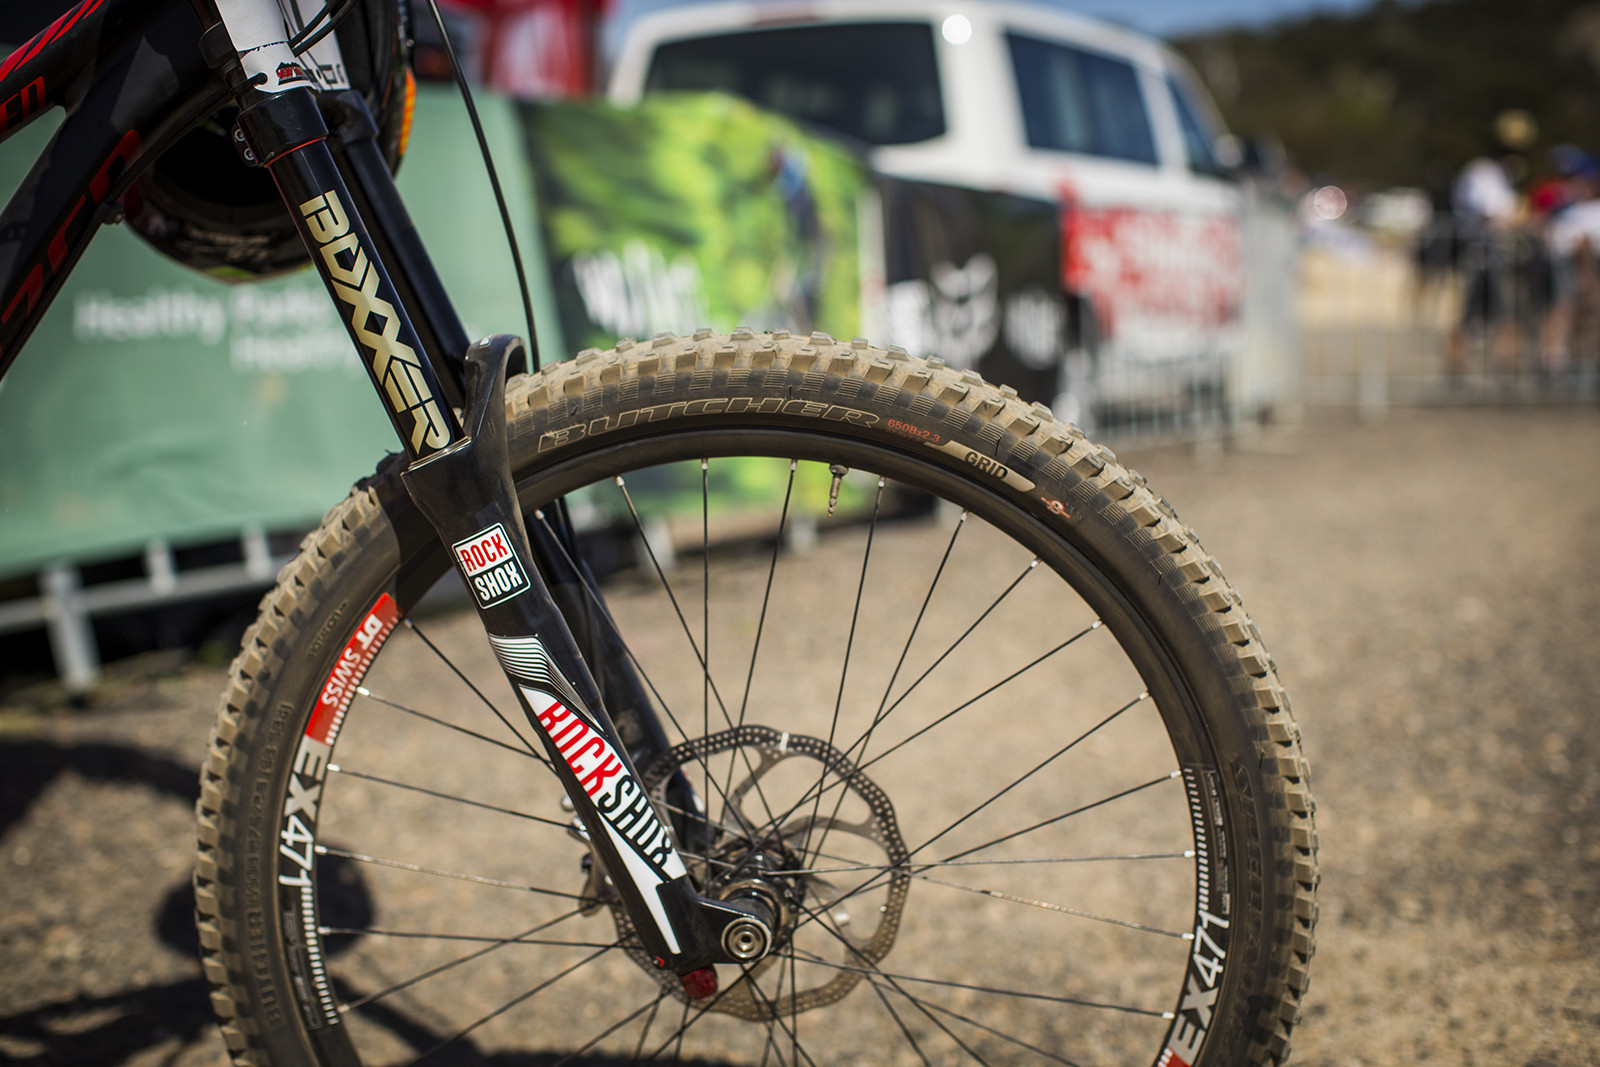 RockShox BoXXer World Cup on Troy Brosnan's Specialized Enduro Expert EVO - WINNING BIKE: Troy Brosnan's Specialized Enduro Expert EVO - Mountain Biking Pictures - Vital MTB